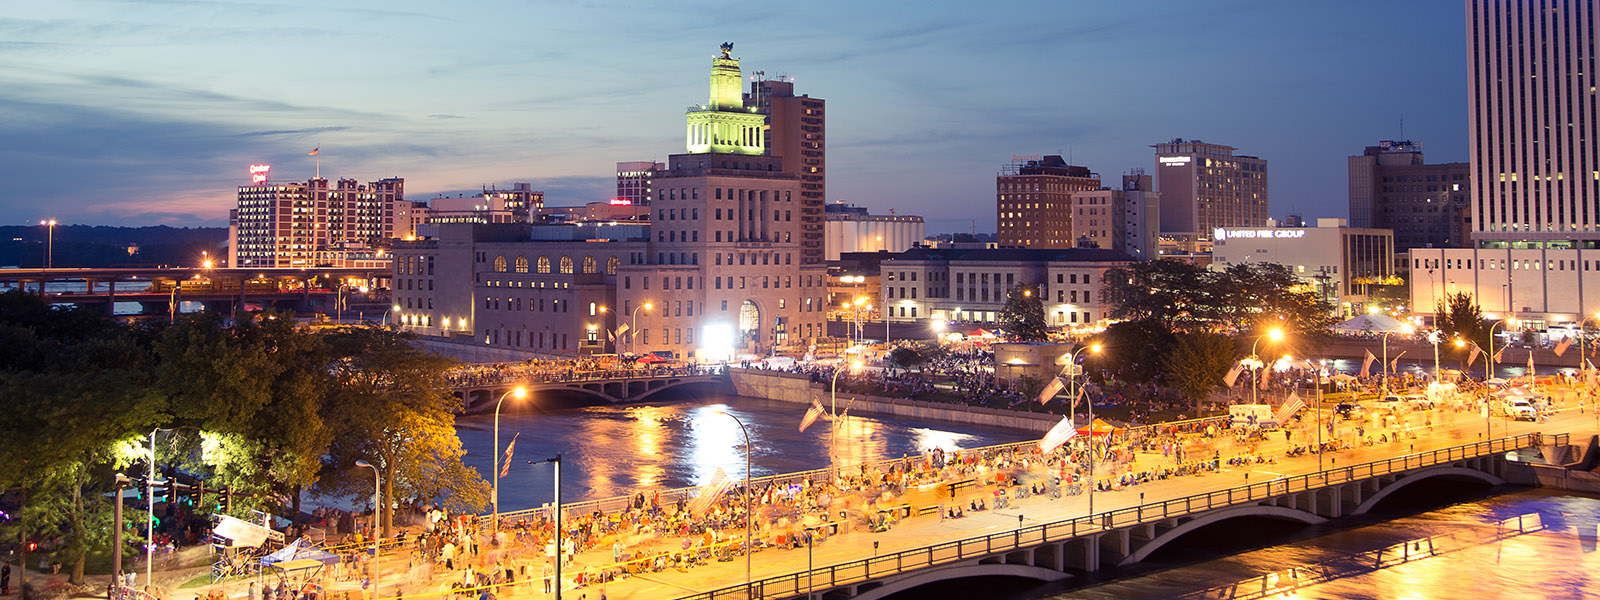 Cedar Rapids-Iowa City skyline